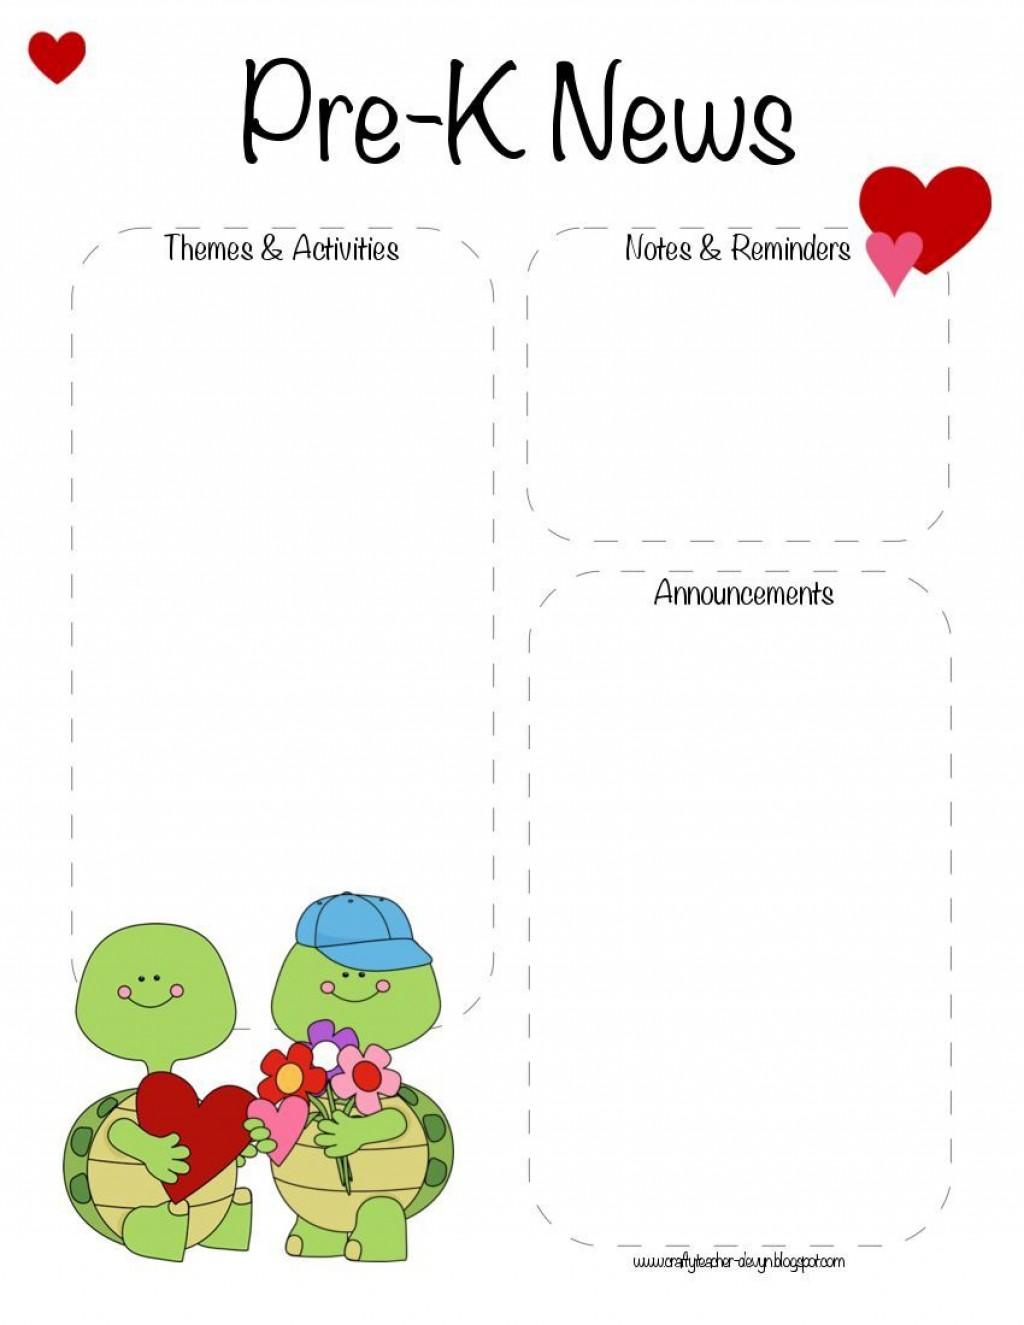 007 Breathtaking Pre K Newsletter Template Idea  Templates Free Printable ClassroomLarge